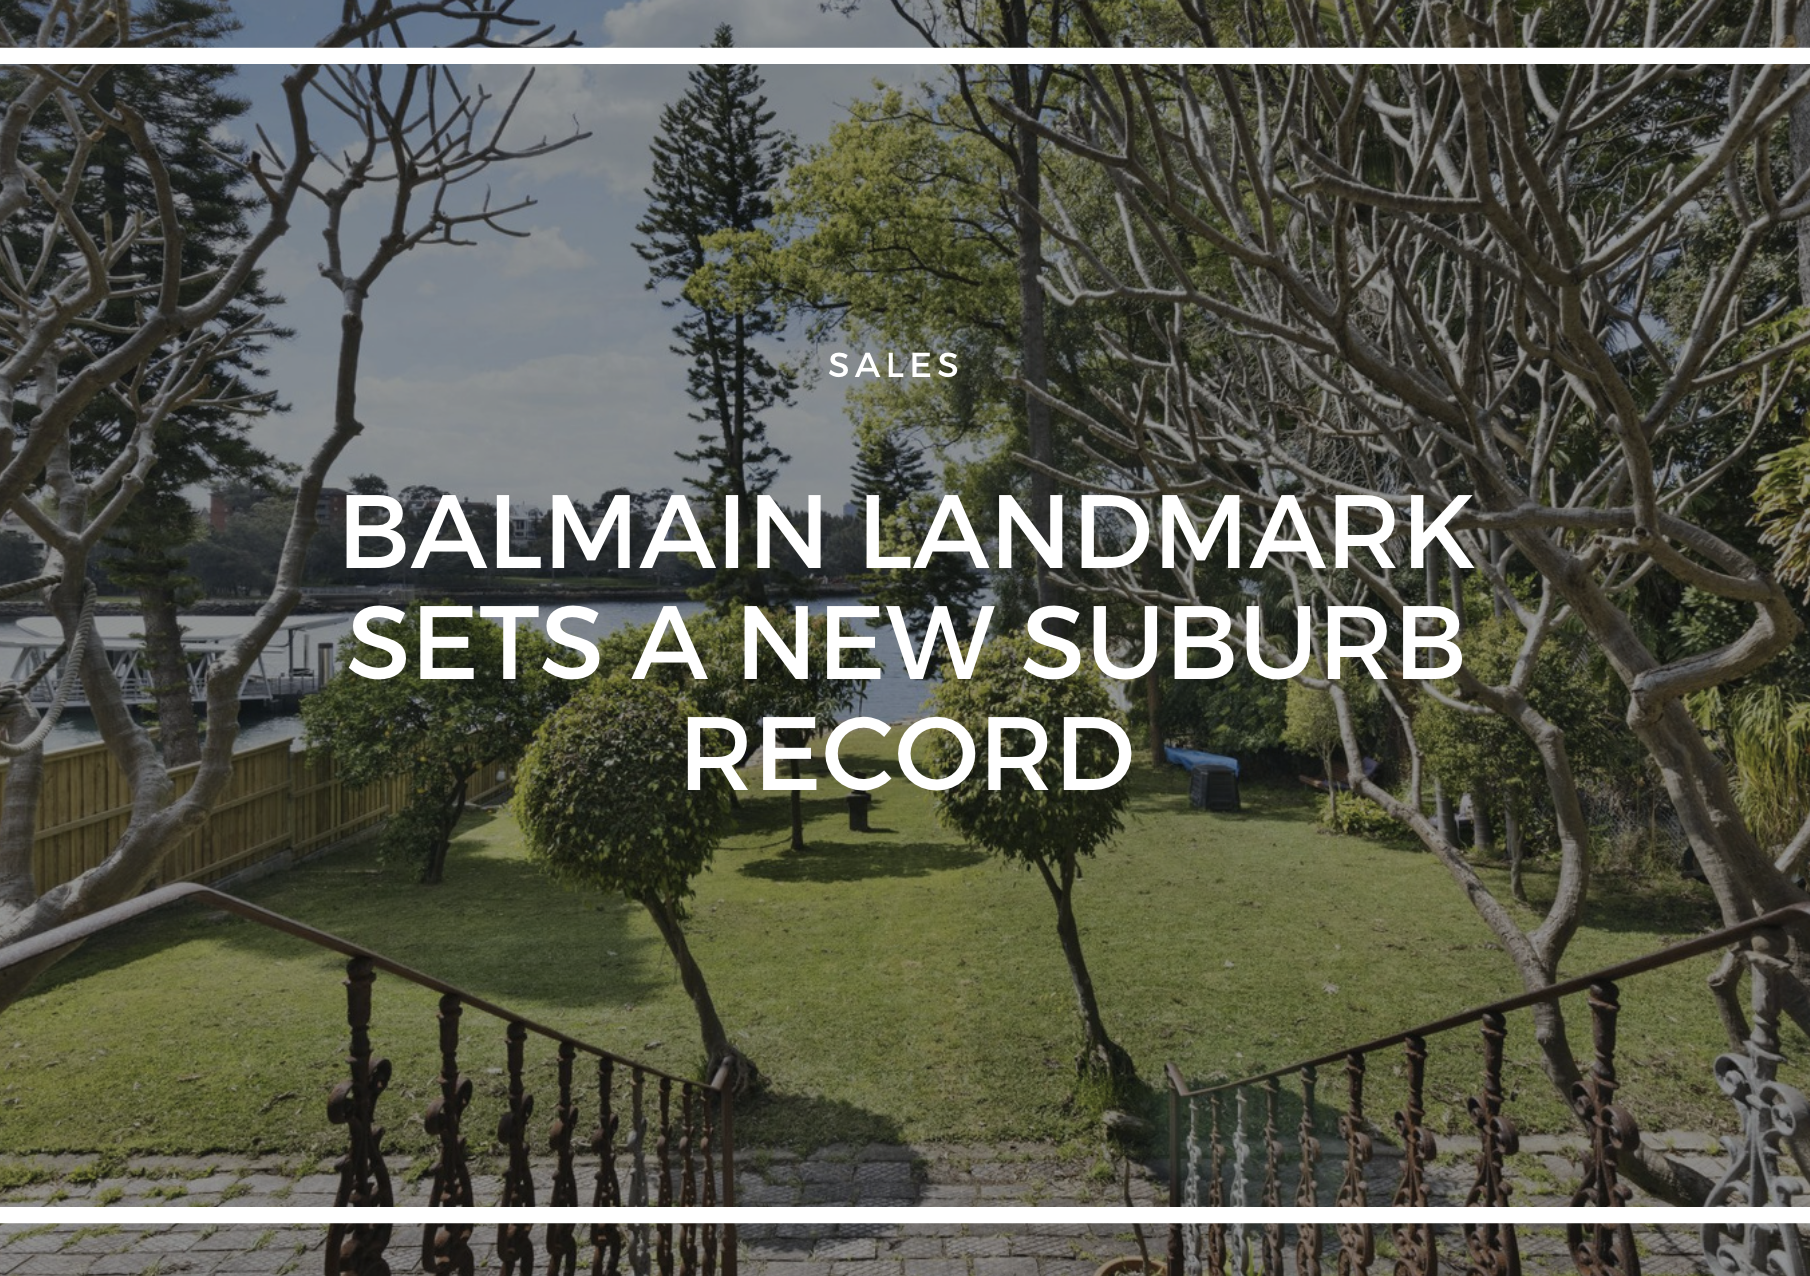 BALMAIN LANDMARK SETS A NEW SUBURB RECORD